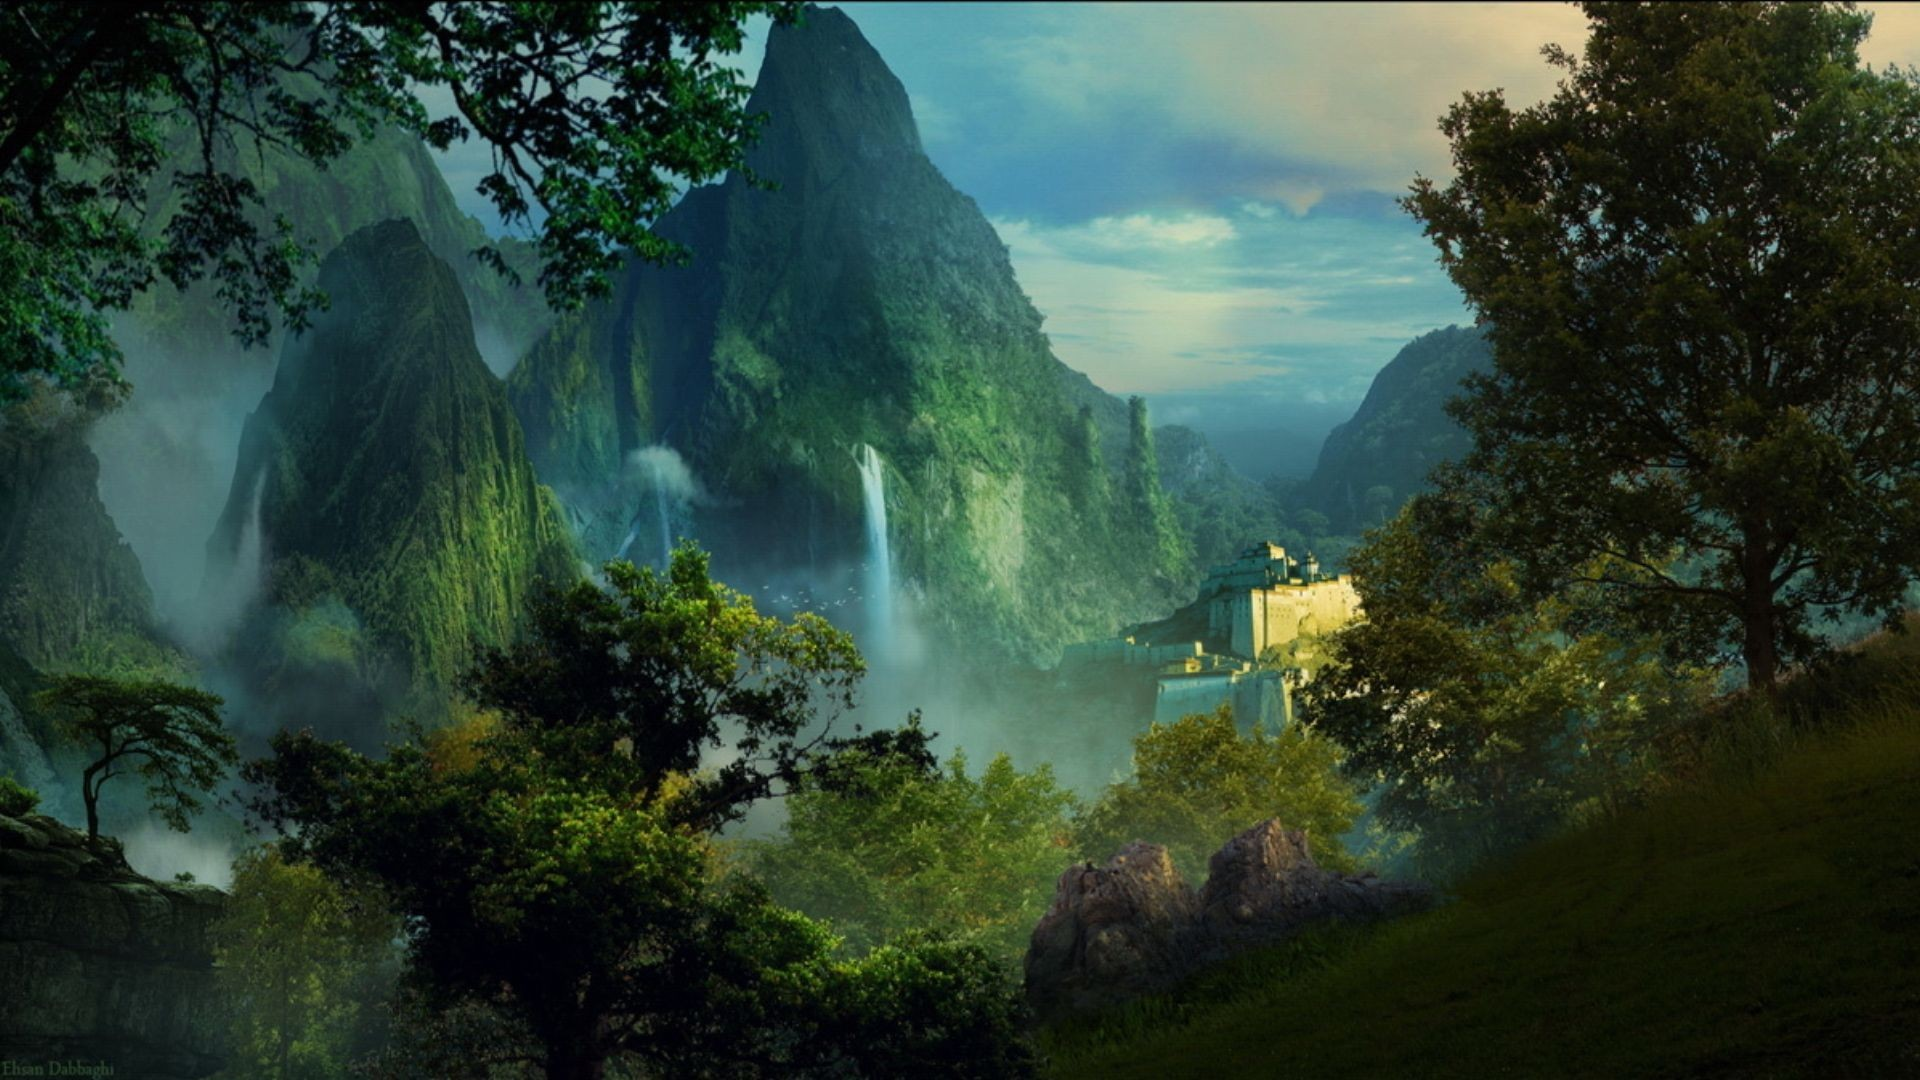 Hd wallpapers fantasy 79 images - 1920x1080 wallpaper 4k ...